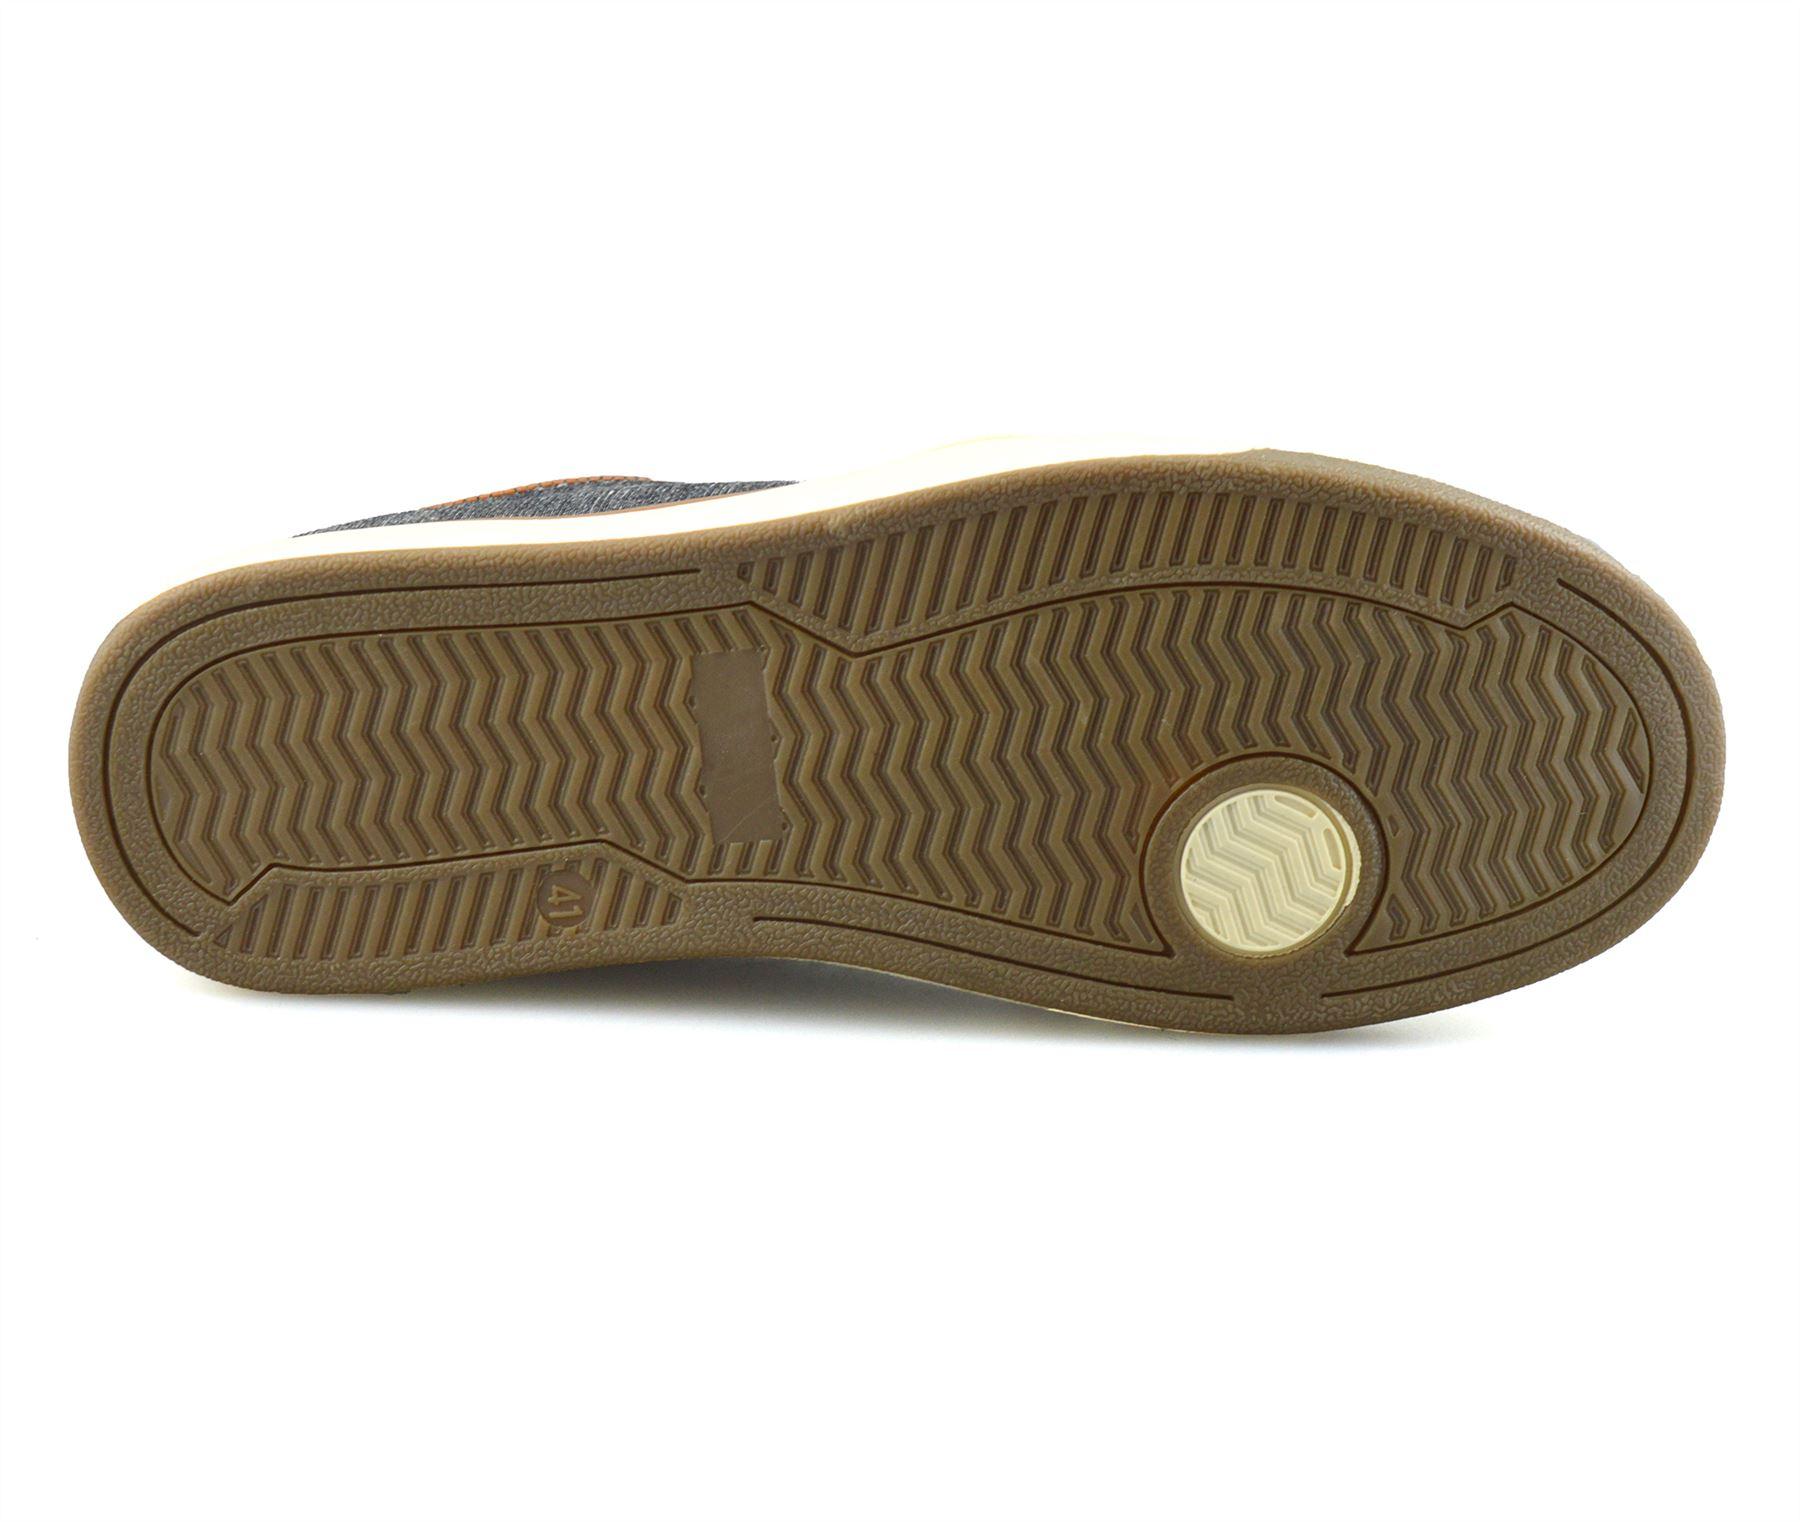 Homme-Nouveau-Casual-Smart-bateau-pont-Mocassin-Walking-Driving-Work-Lace-Up-Chaussures-Taille miniature 15